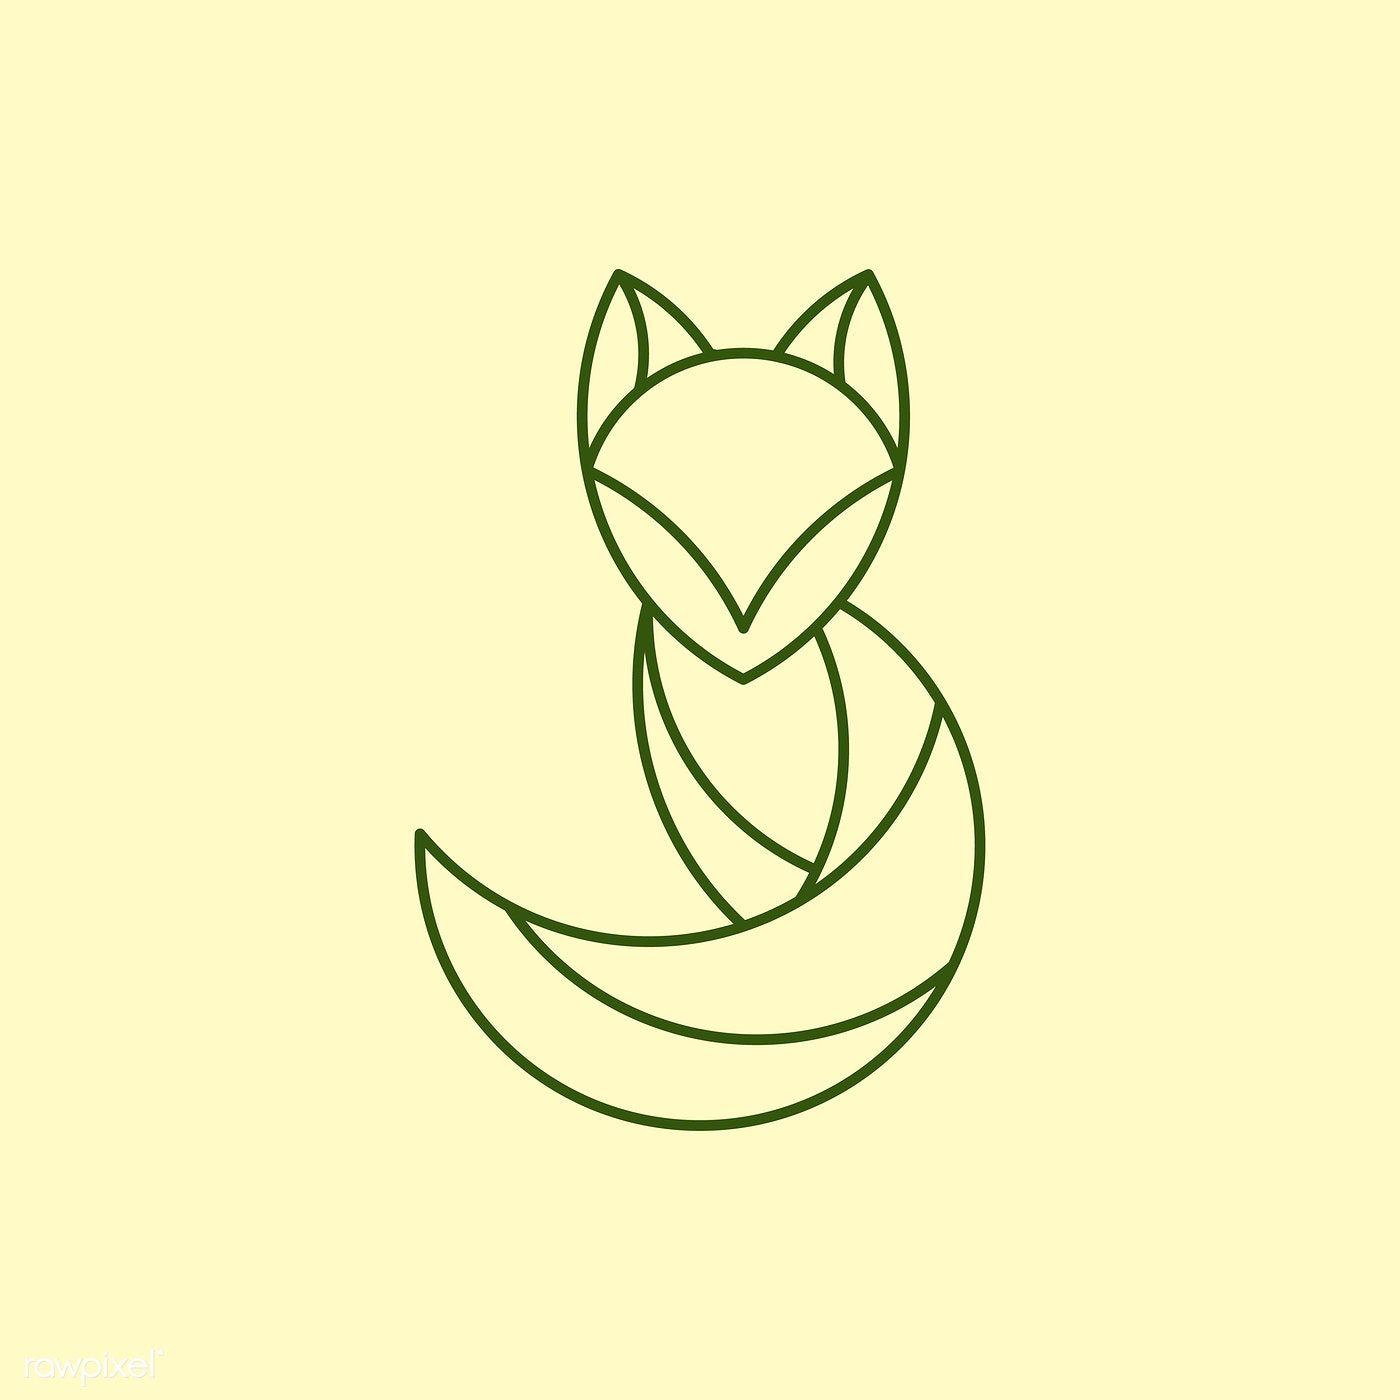 Linear fox geometrical animal vector   free image by rawpixel.com / Aew